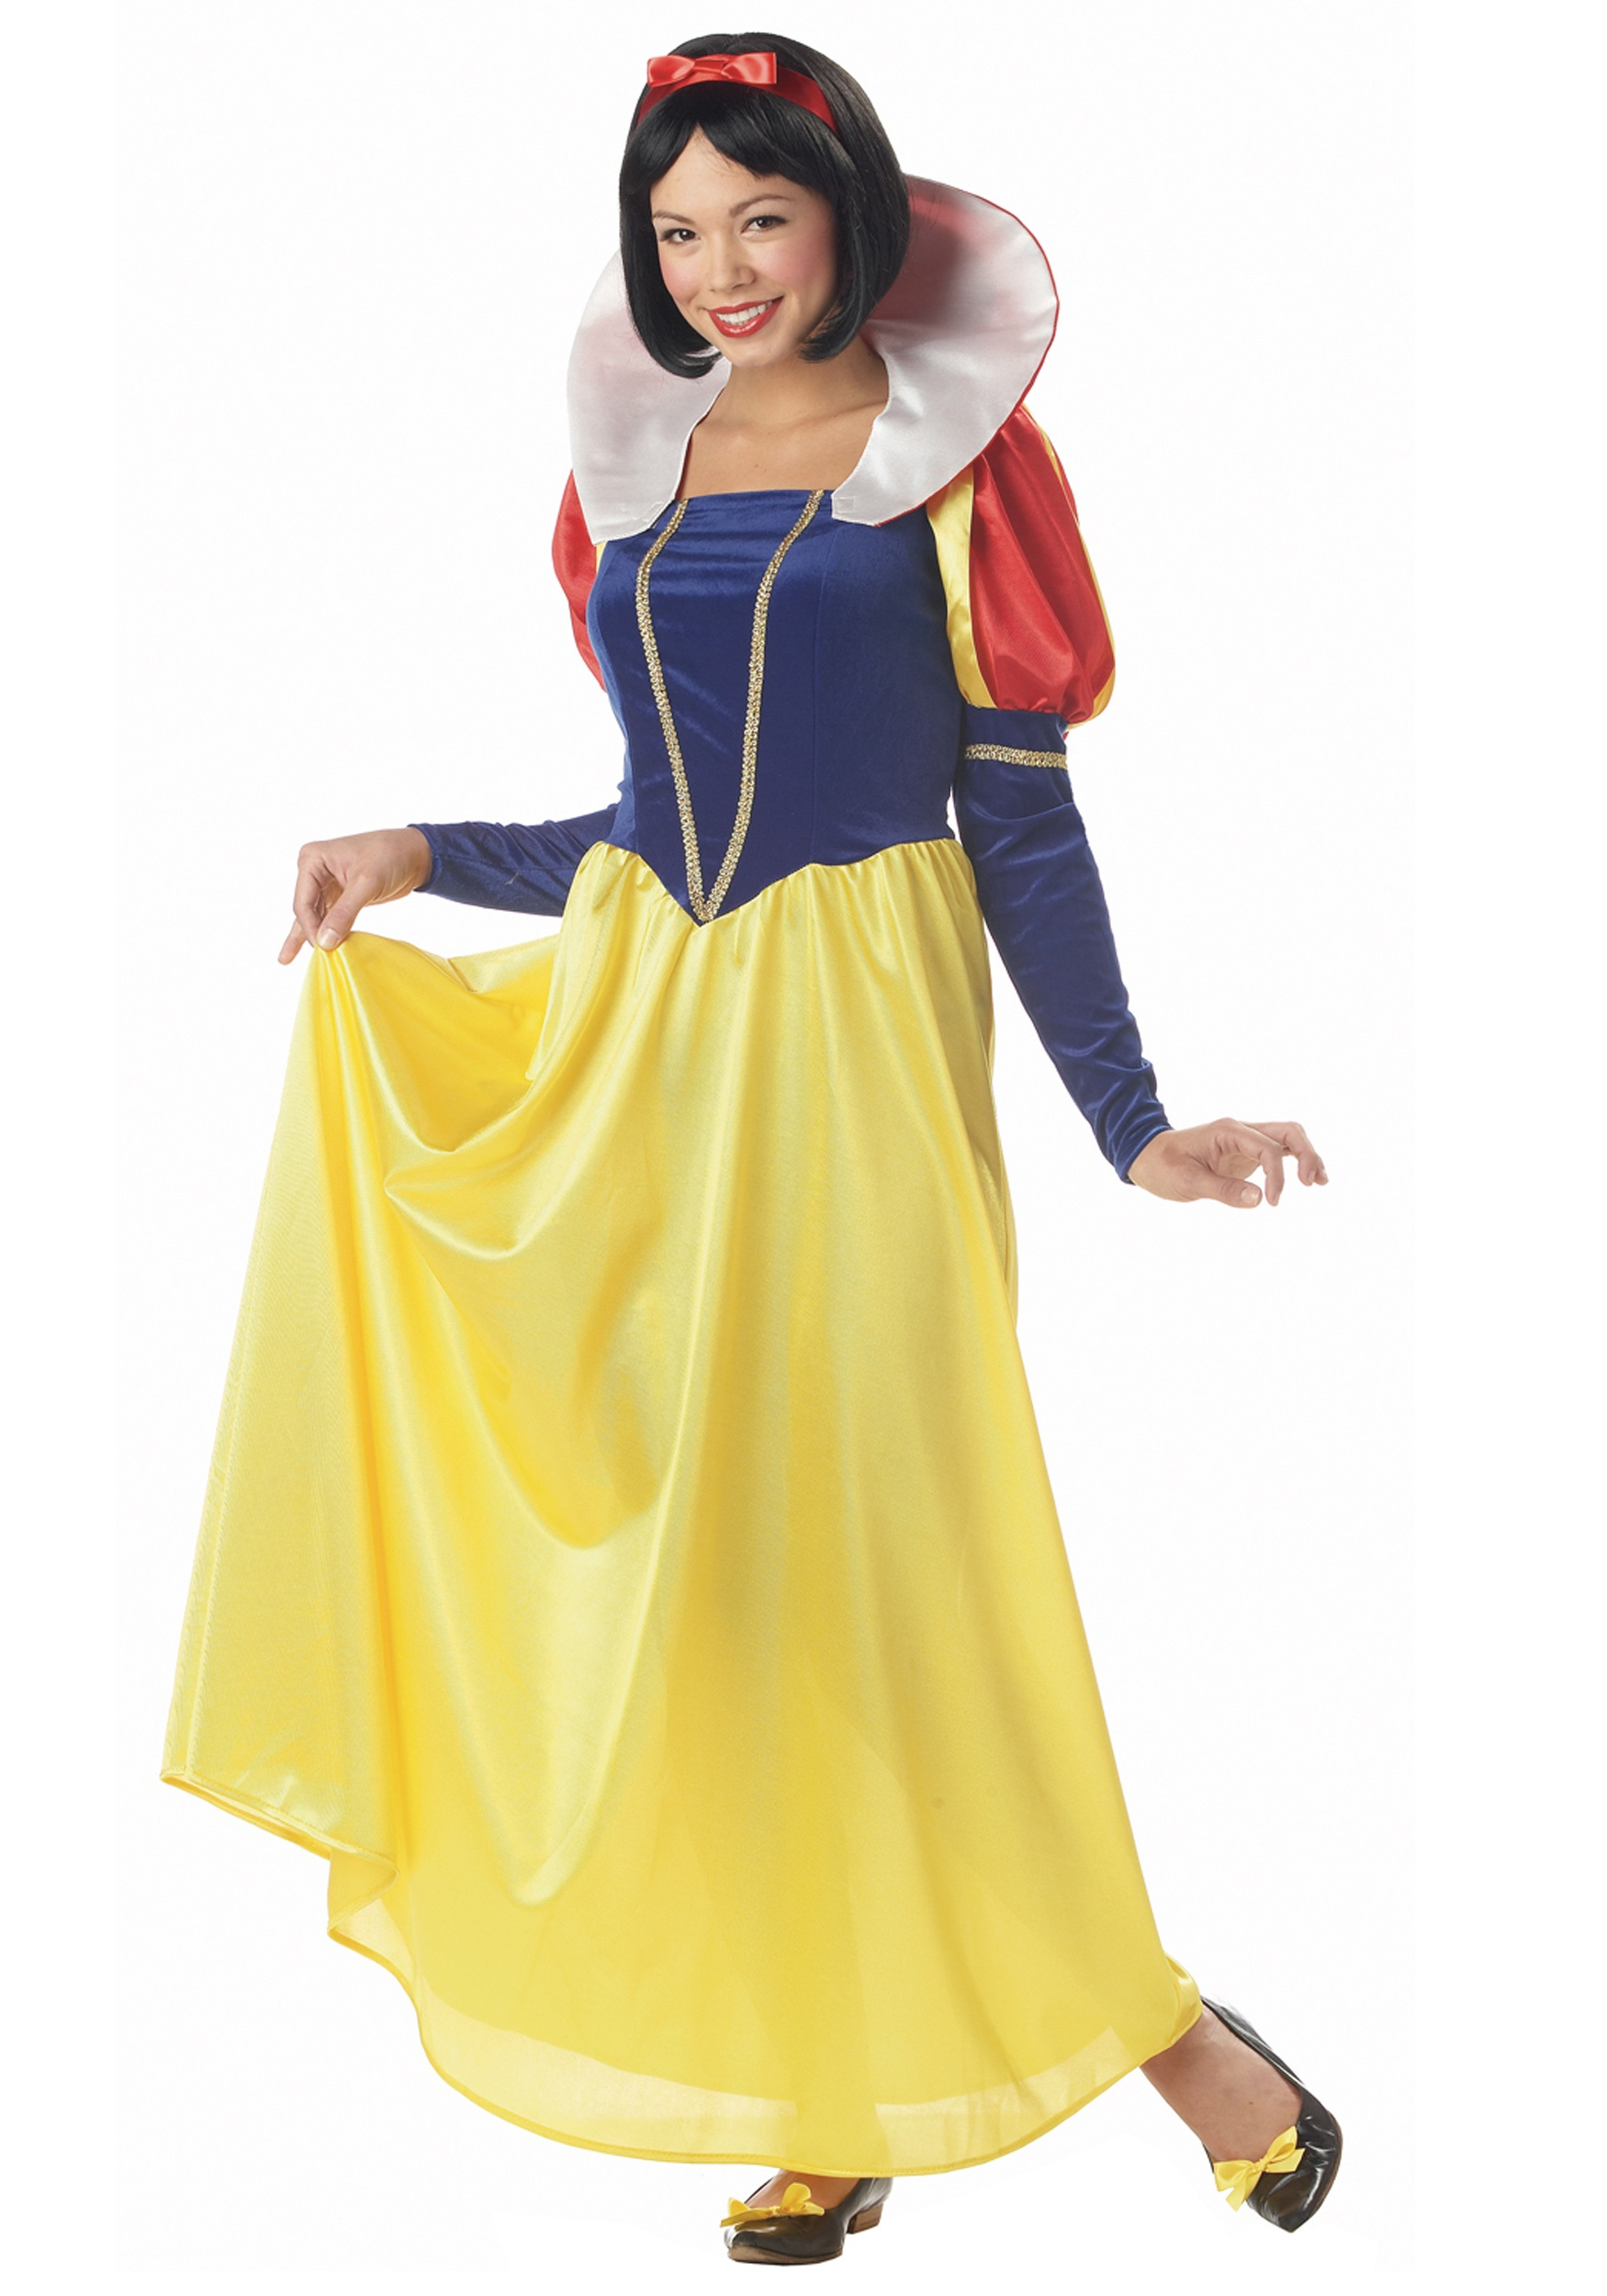 Adult Halloween Costumes Funny Easy Walmart Canada